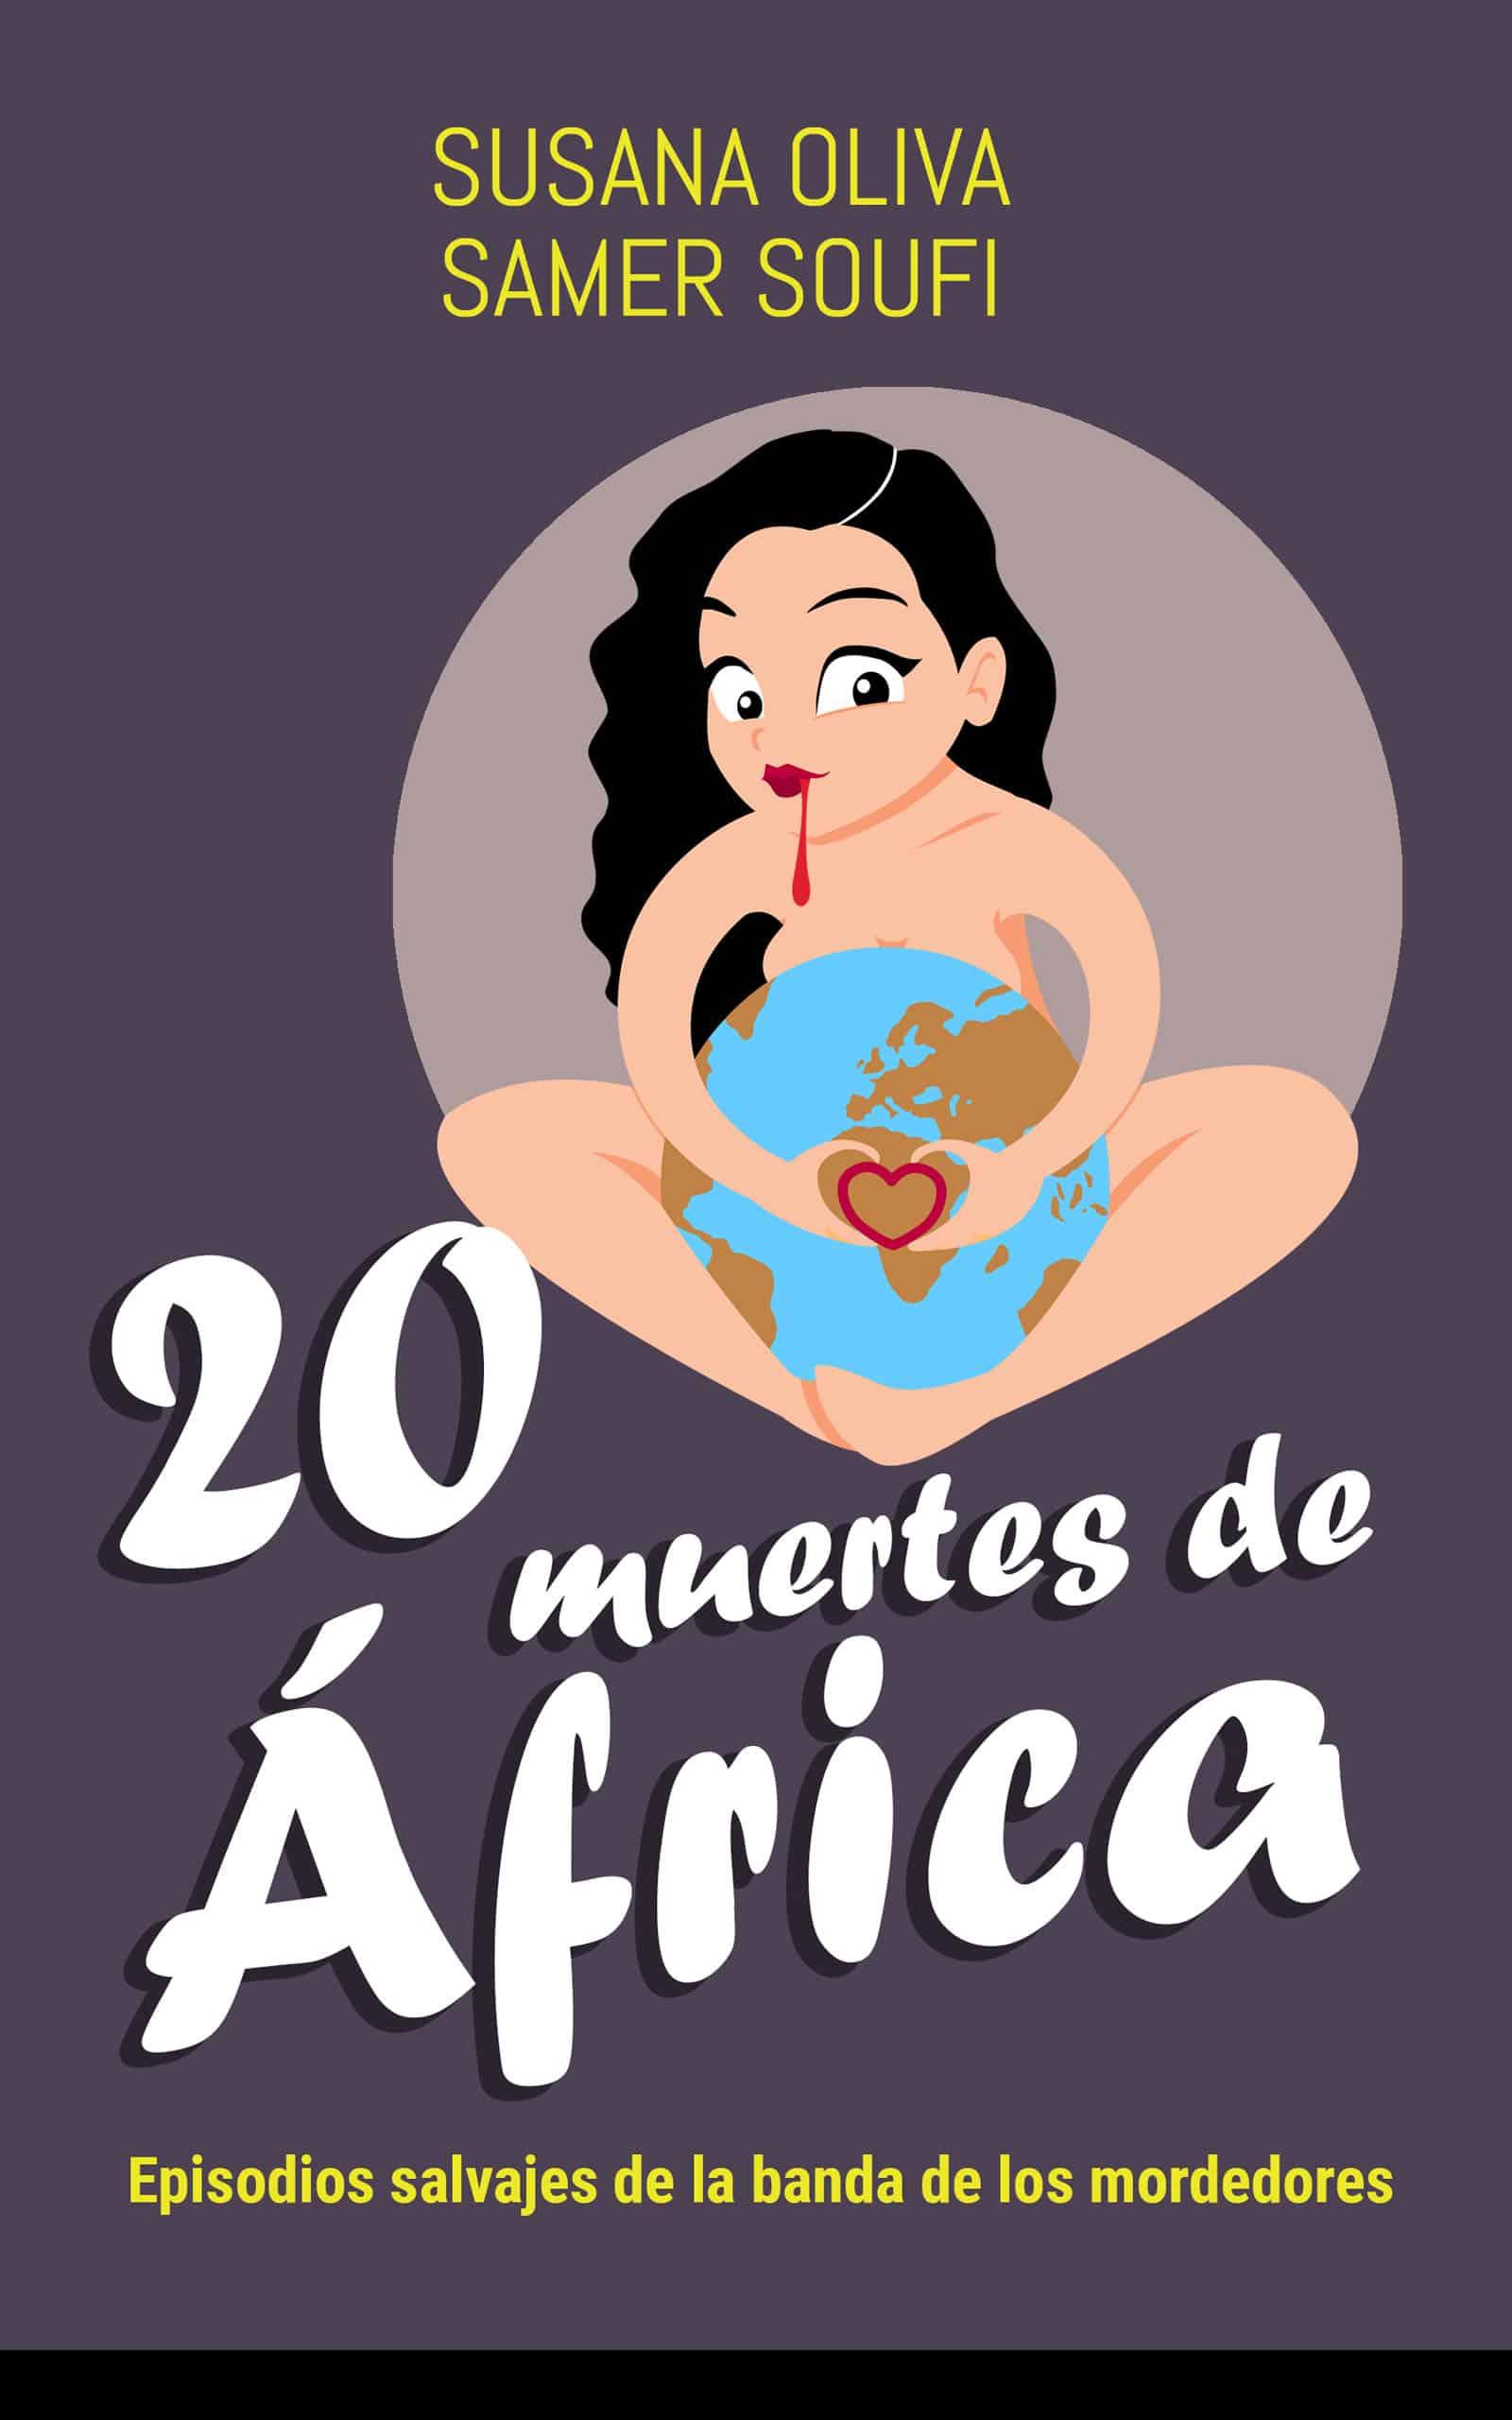 20 muertes de África, de Samer Soufi